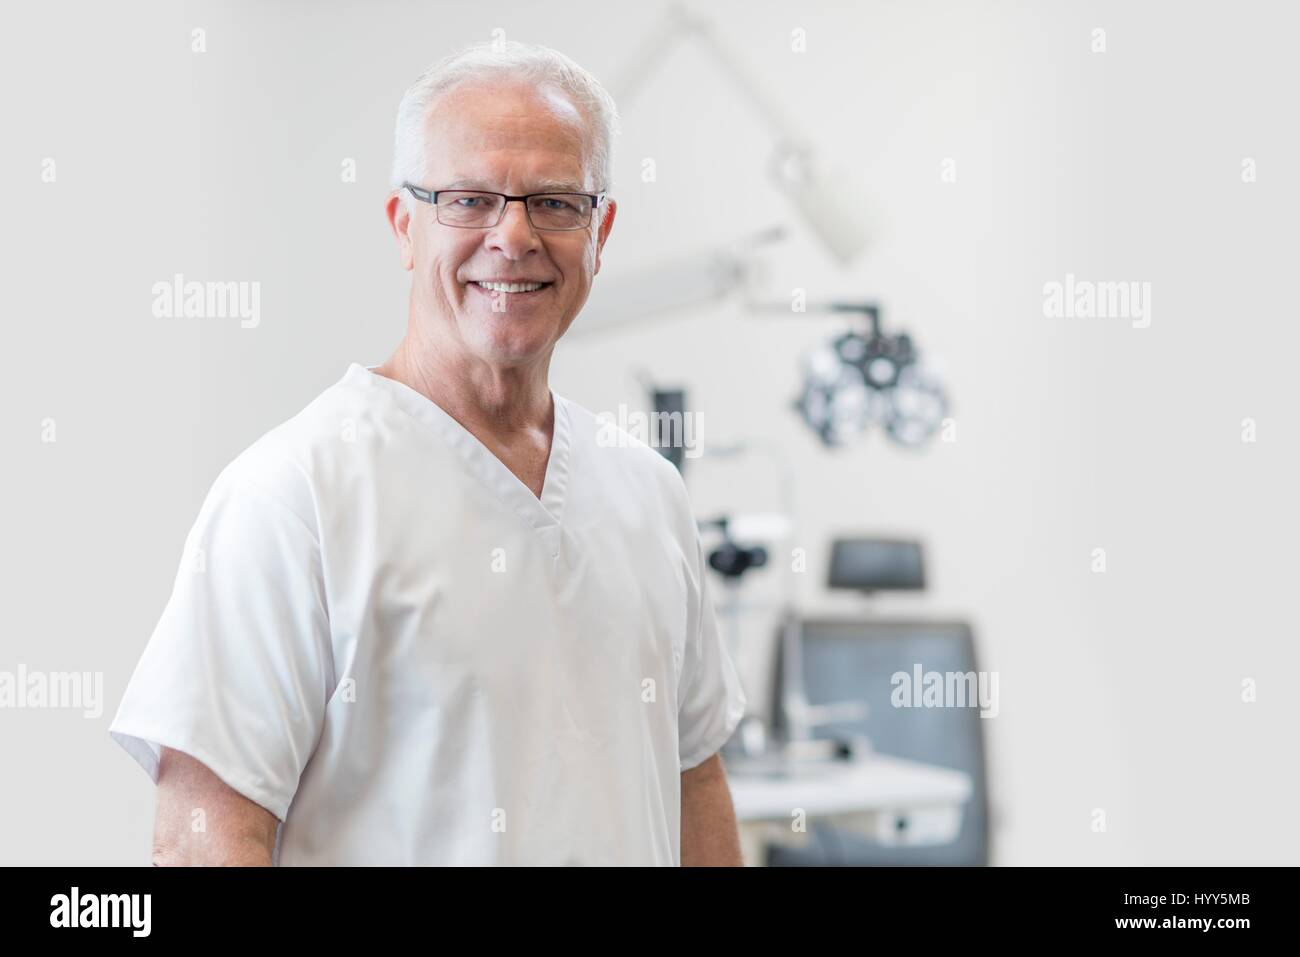 Senior male doctor dentist towards camera, portrait. - Stock Image